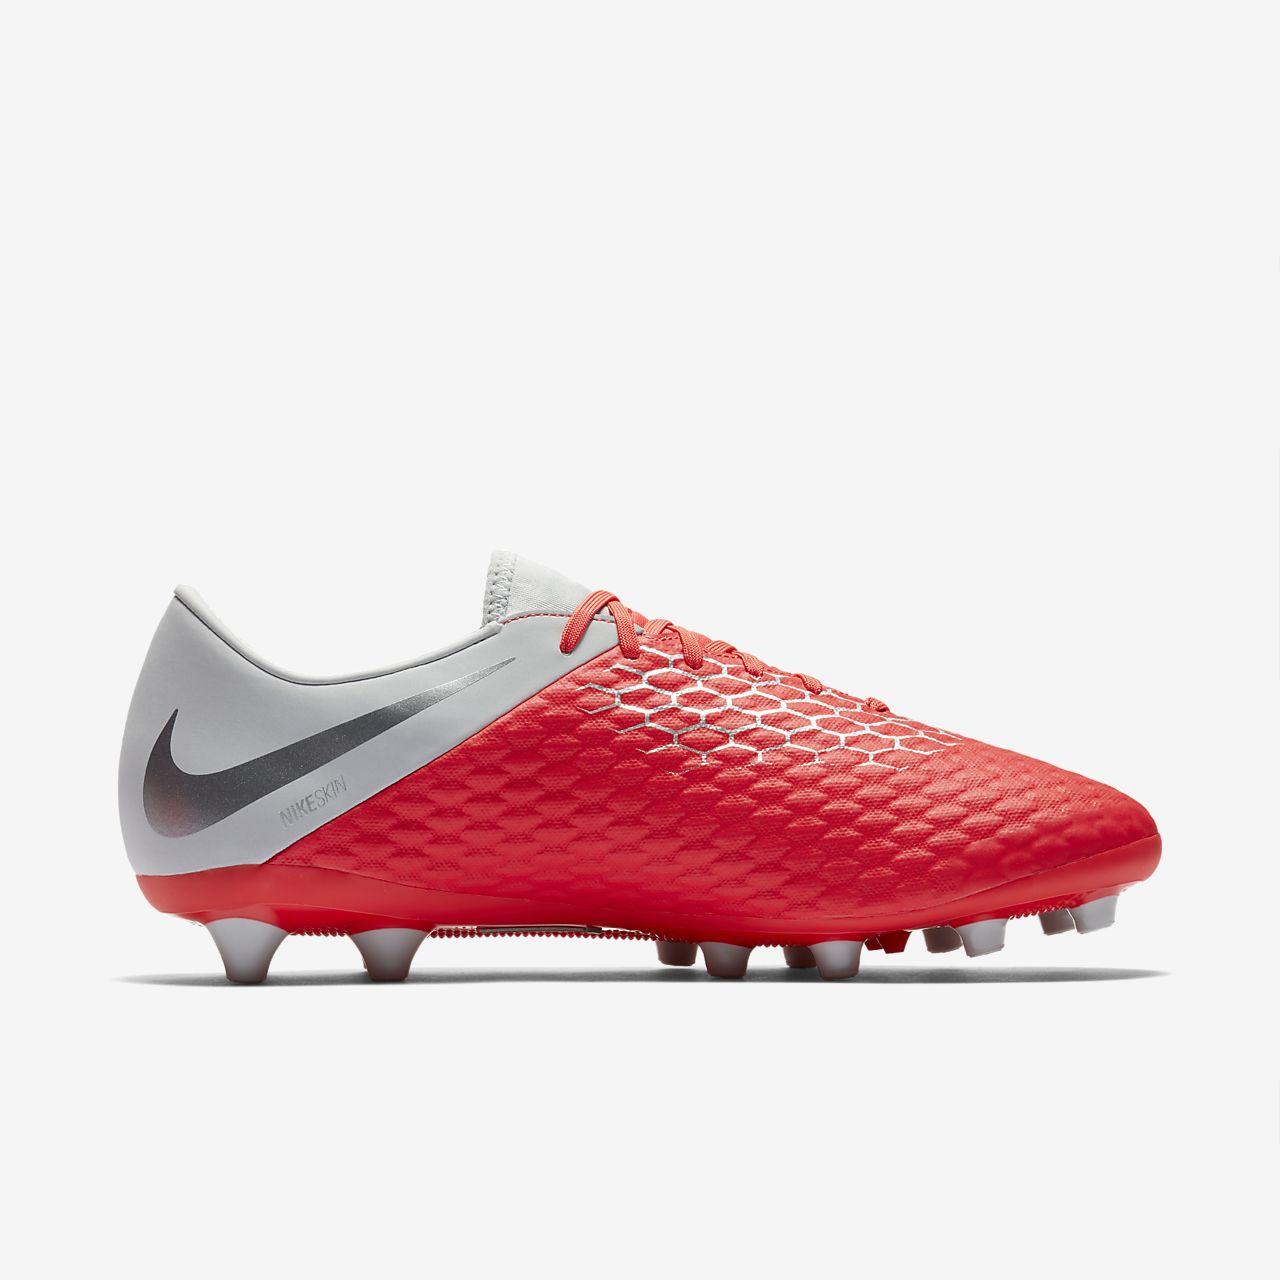 best cheap 88555 0fc34 ... Chaussure de football à crampons pour terrain synthétique Nike  Hypervenom III Academy AG-PRO